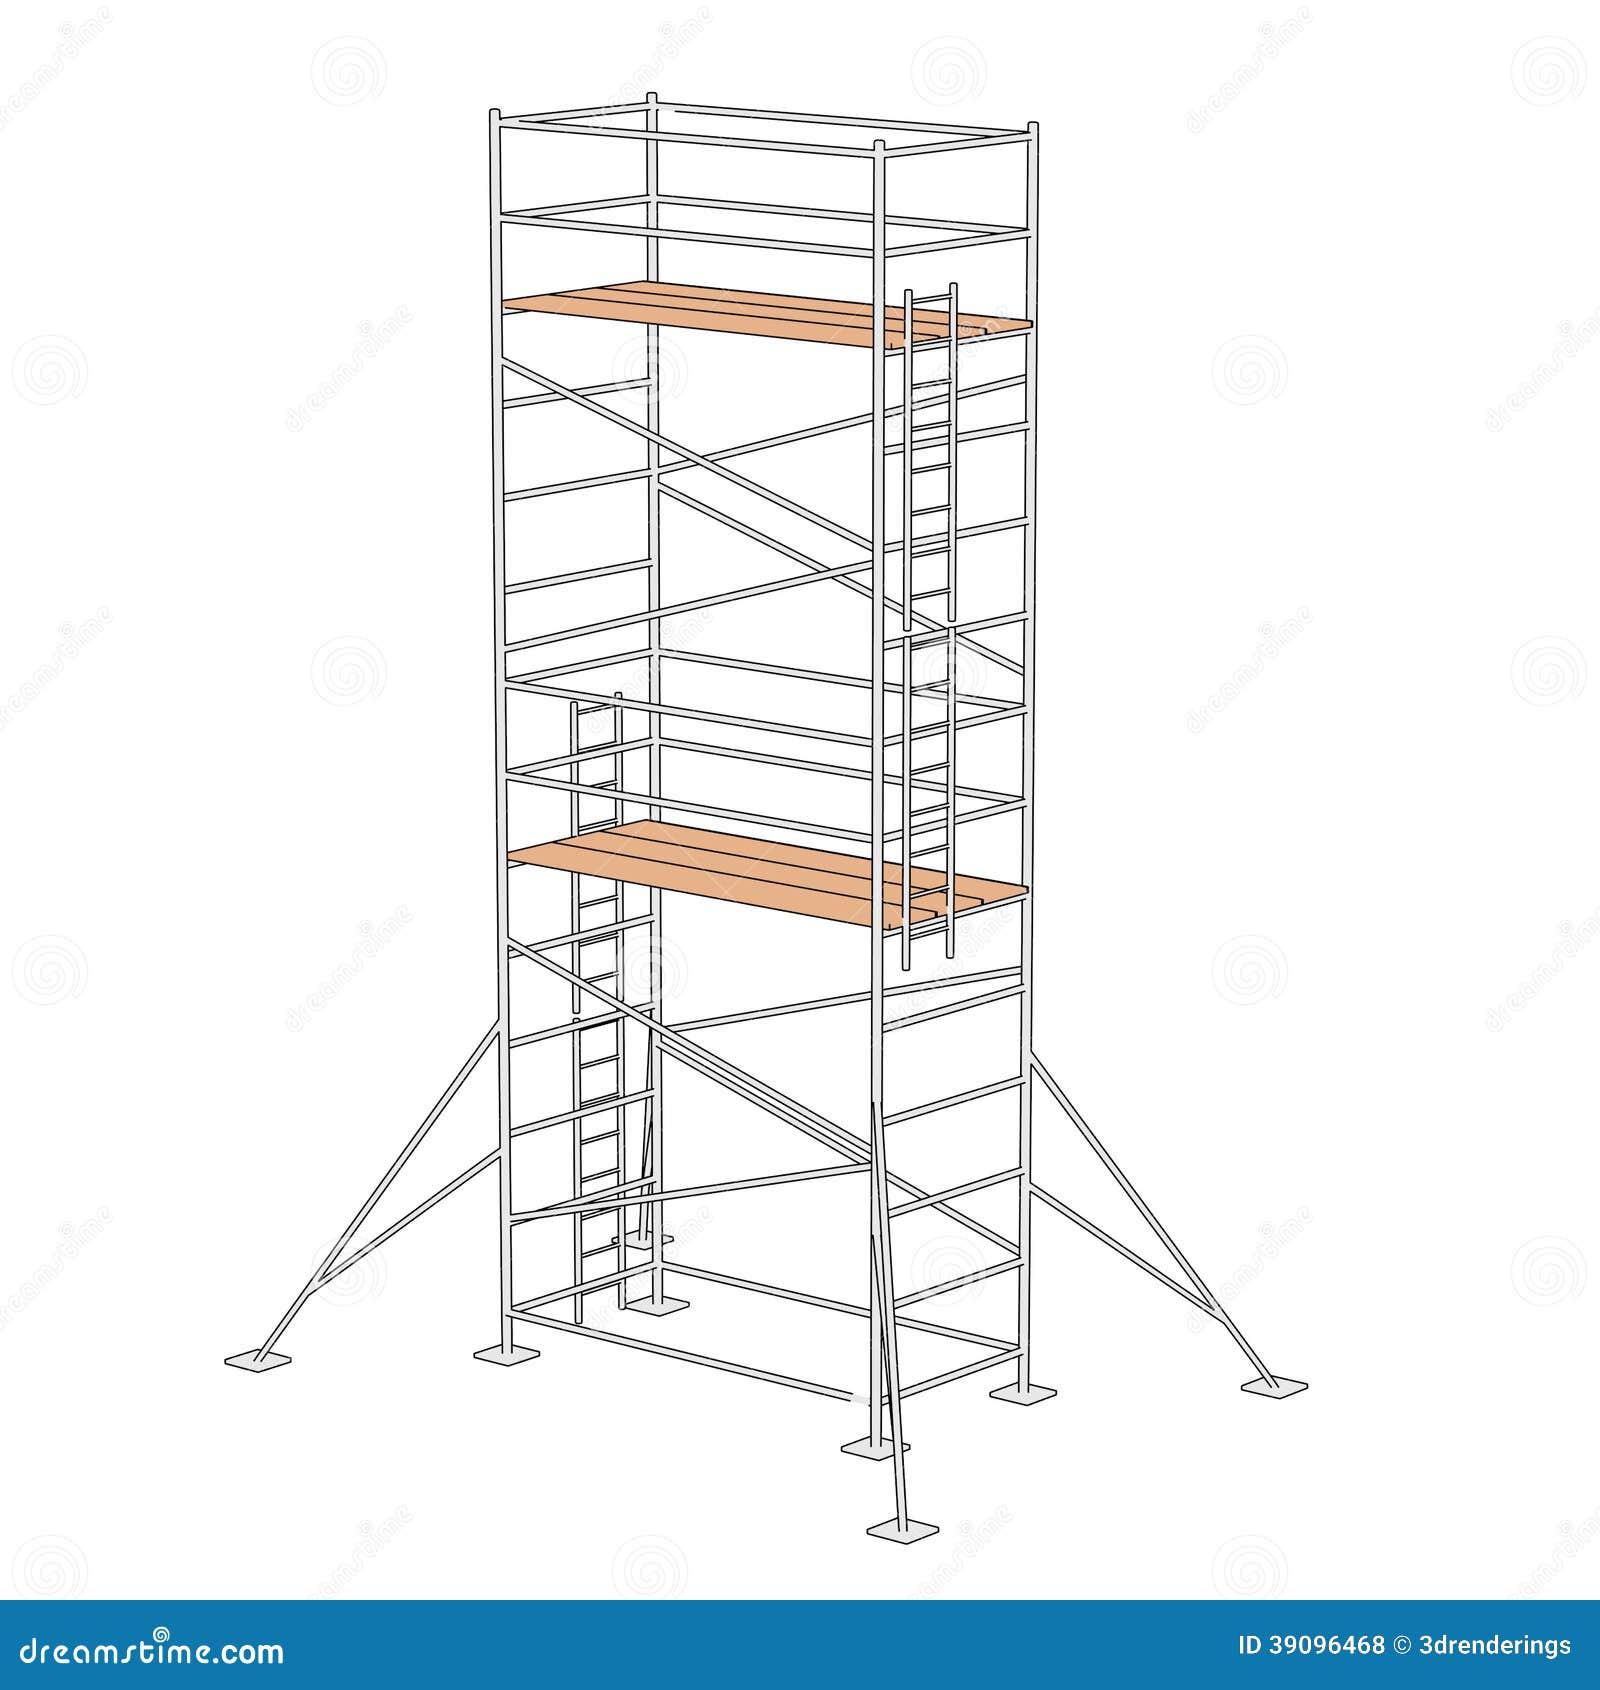 Construction Scaffolding Design : Construction scaffolding stock illustration image